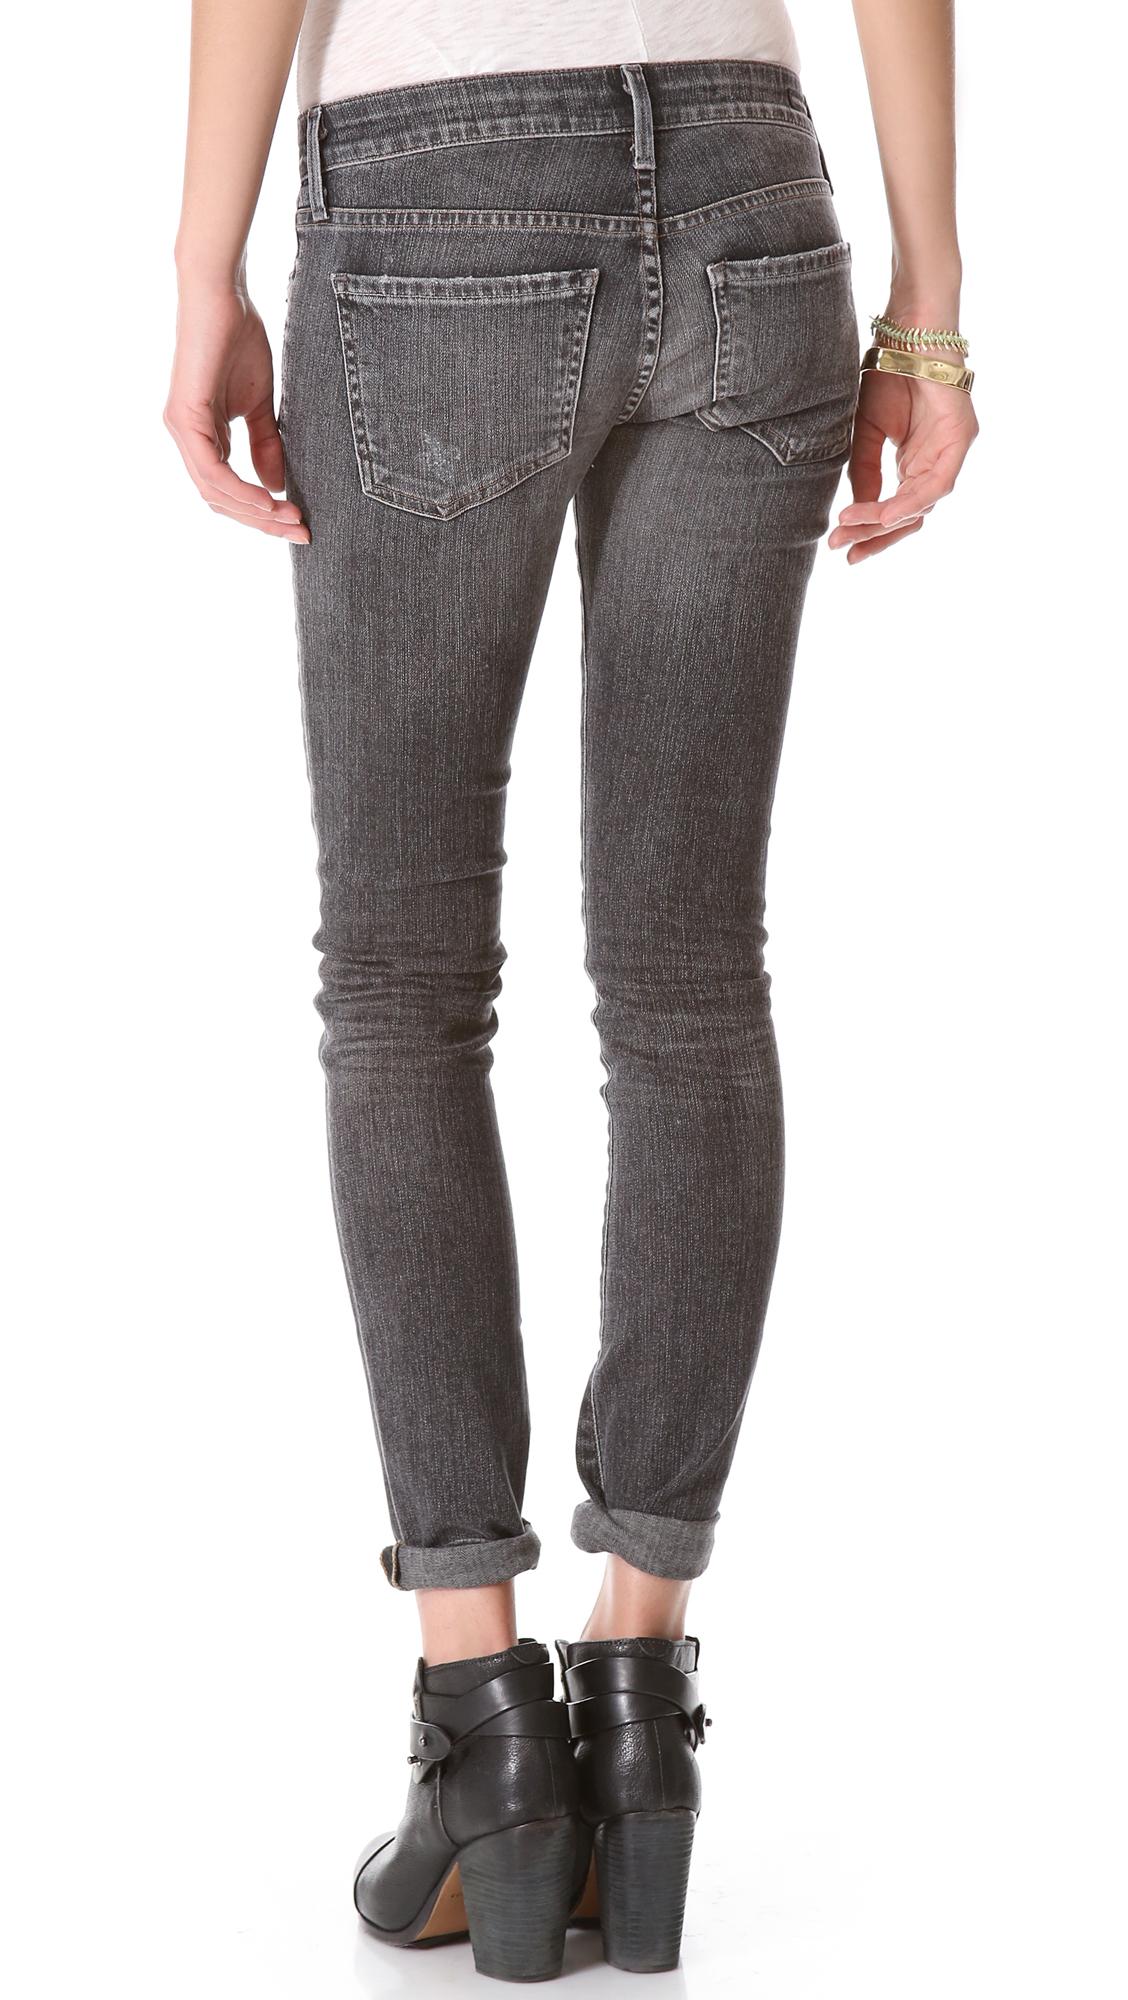 Racer' low rise skinny jeans (slash)